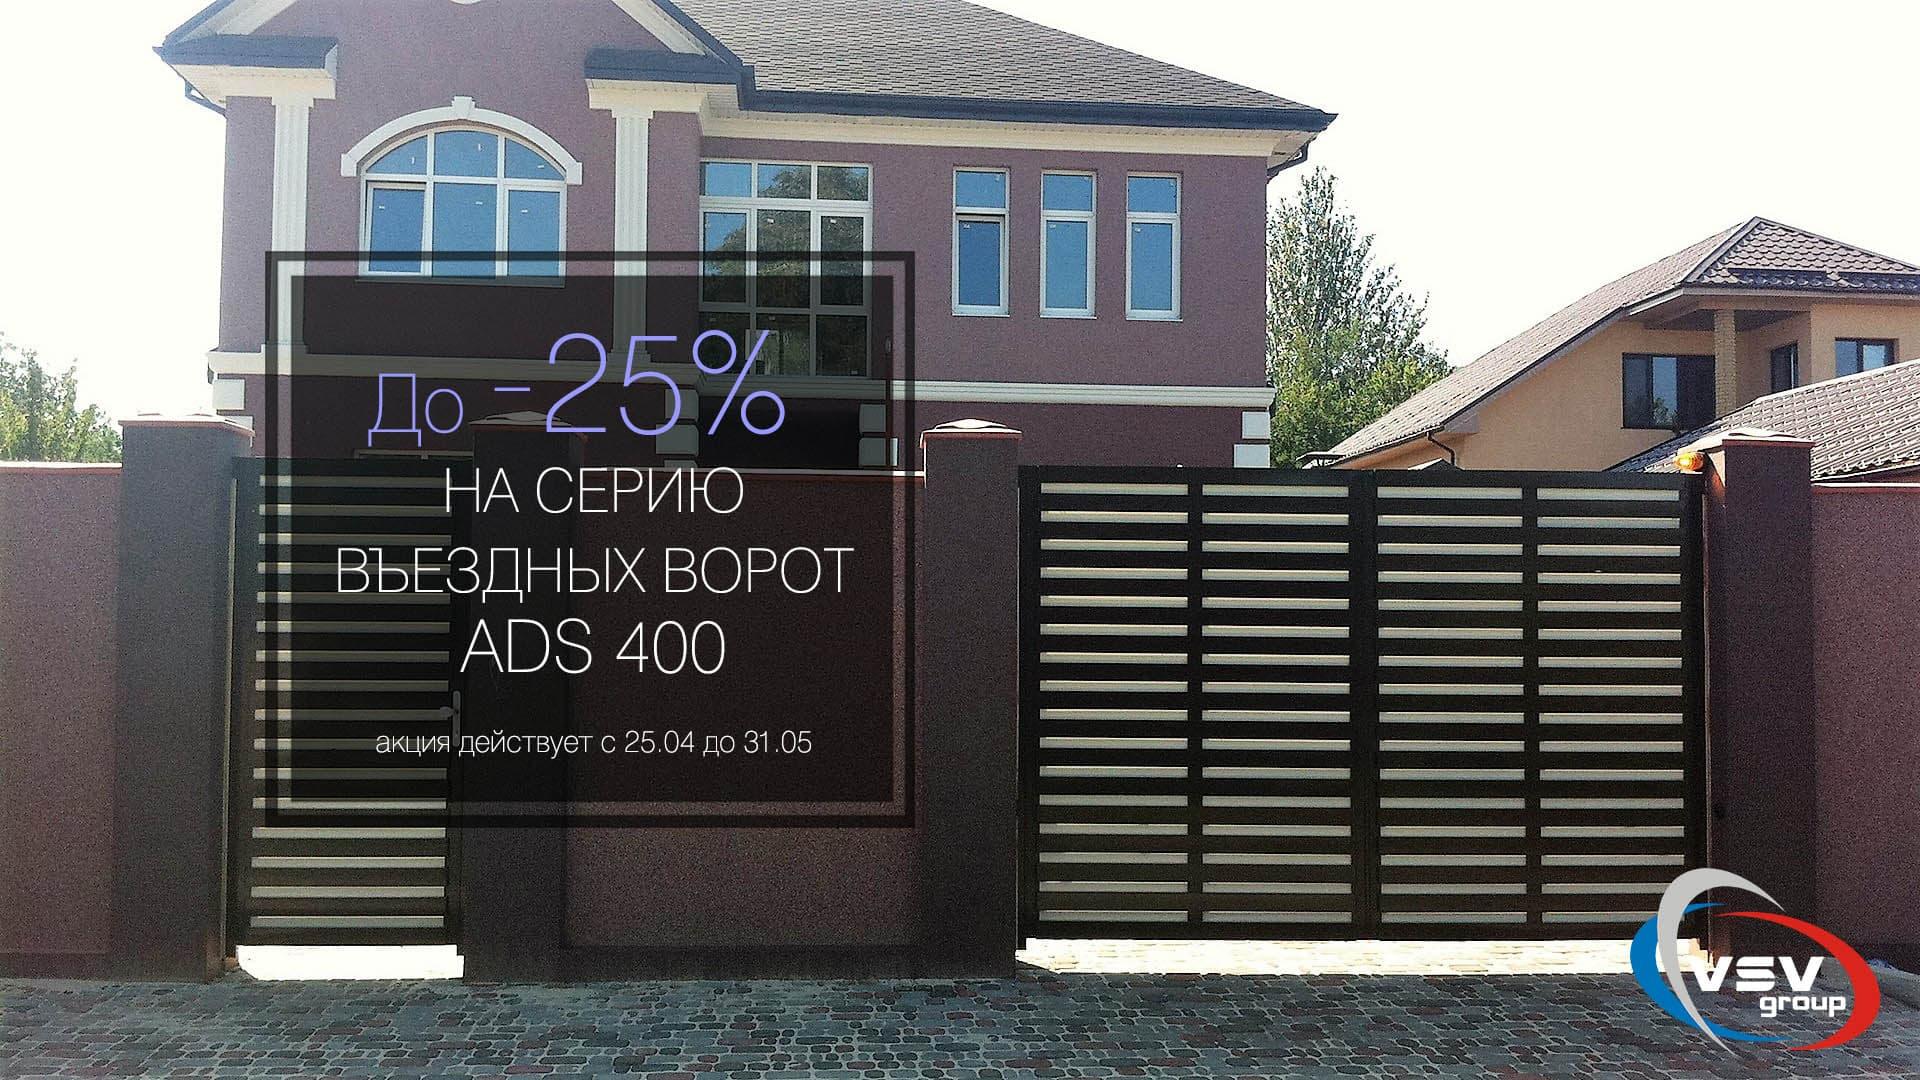 ЭРА алюминиевых ворот и калиток! Серия ADS400 по приятной цене -25% - фото - акции от компании ВСВ-Групп